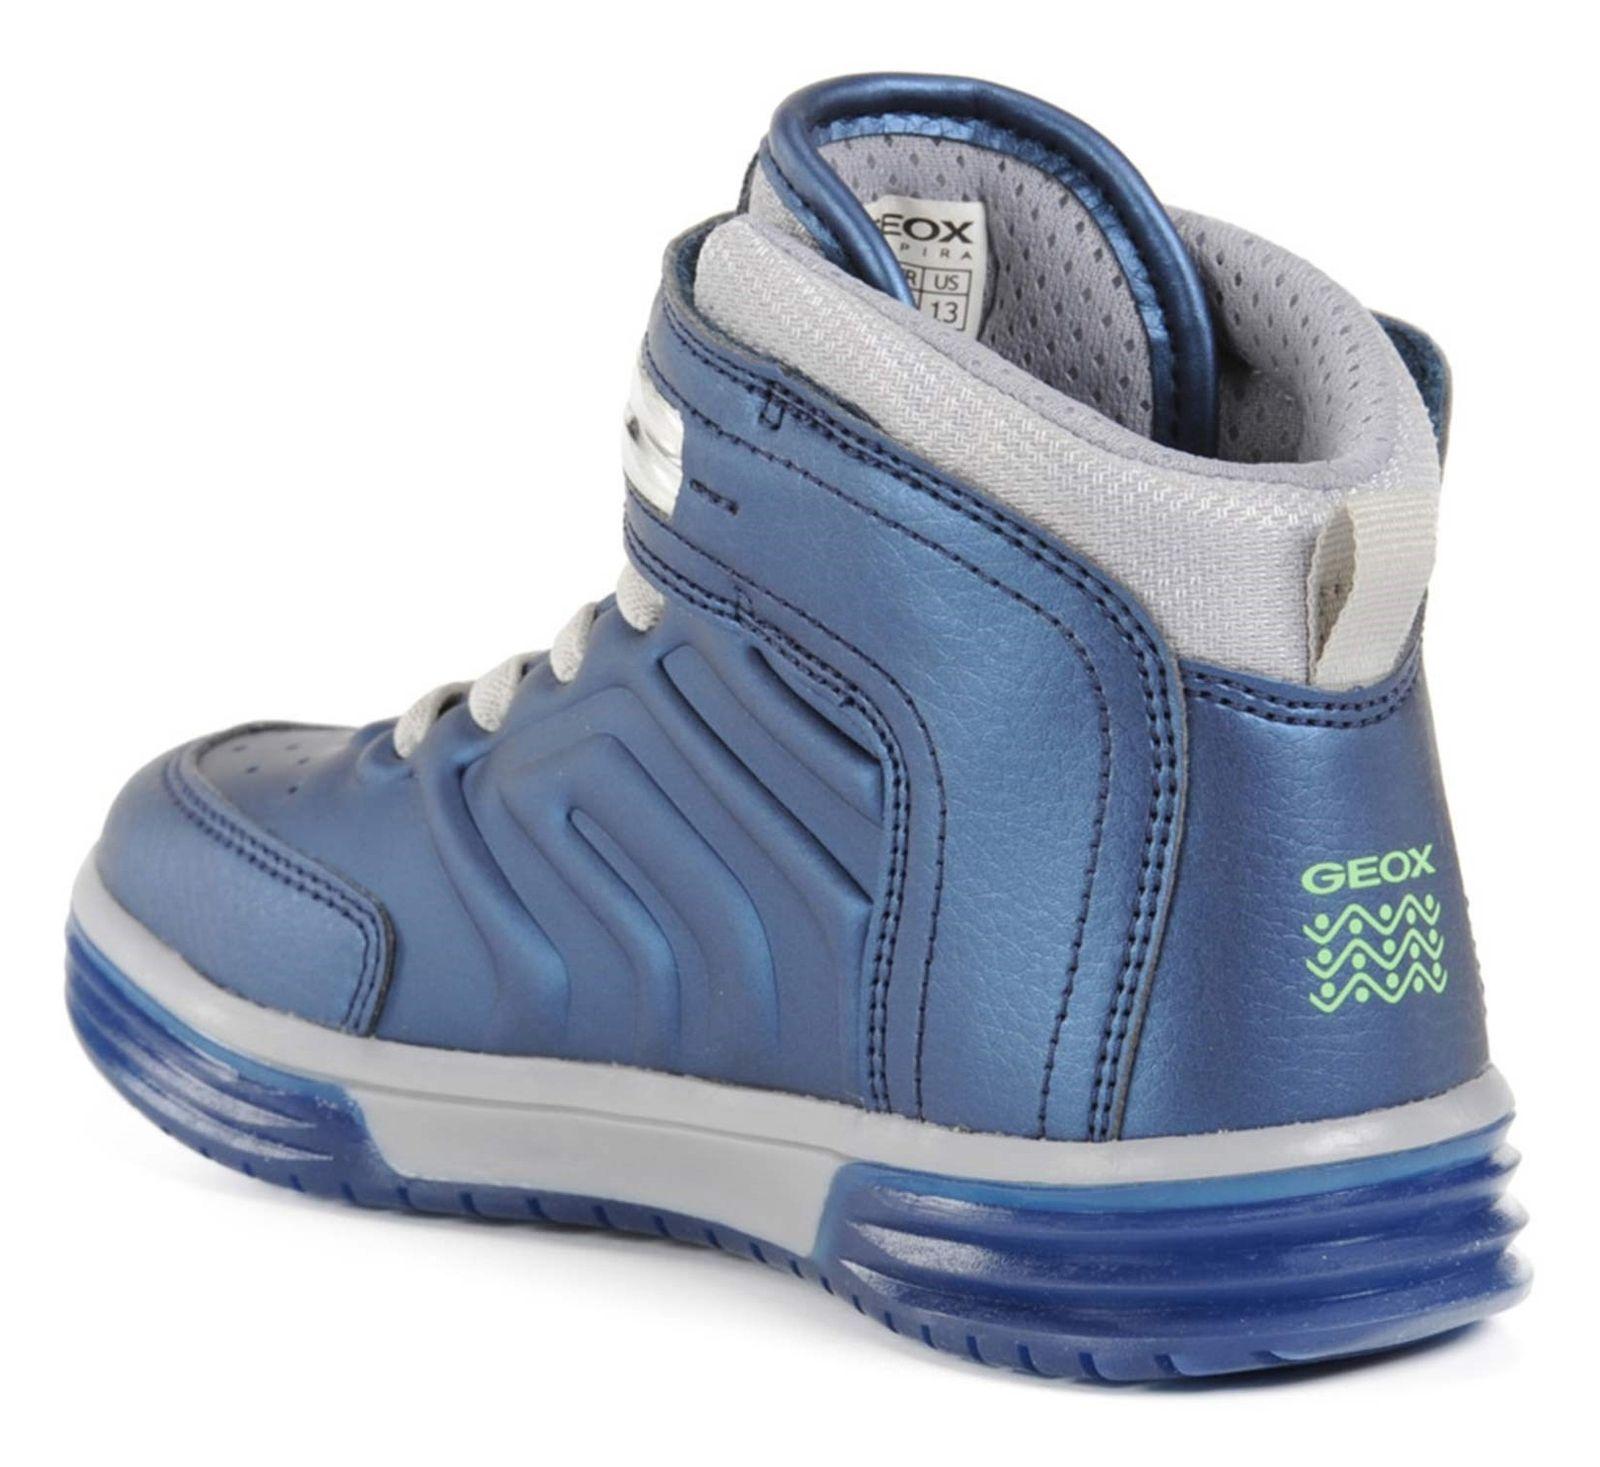 کفش ورزشی پسرانه Argonat - جی اوکس - آبي - 4